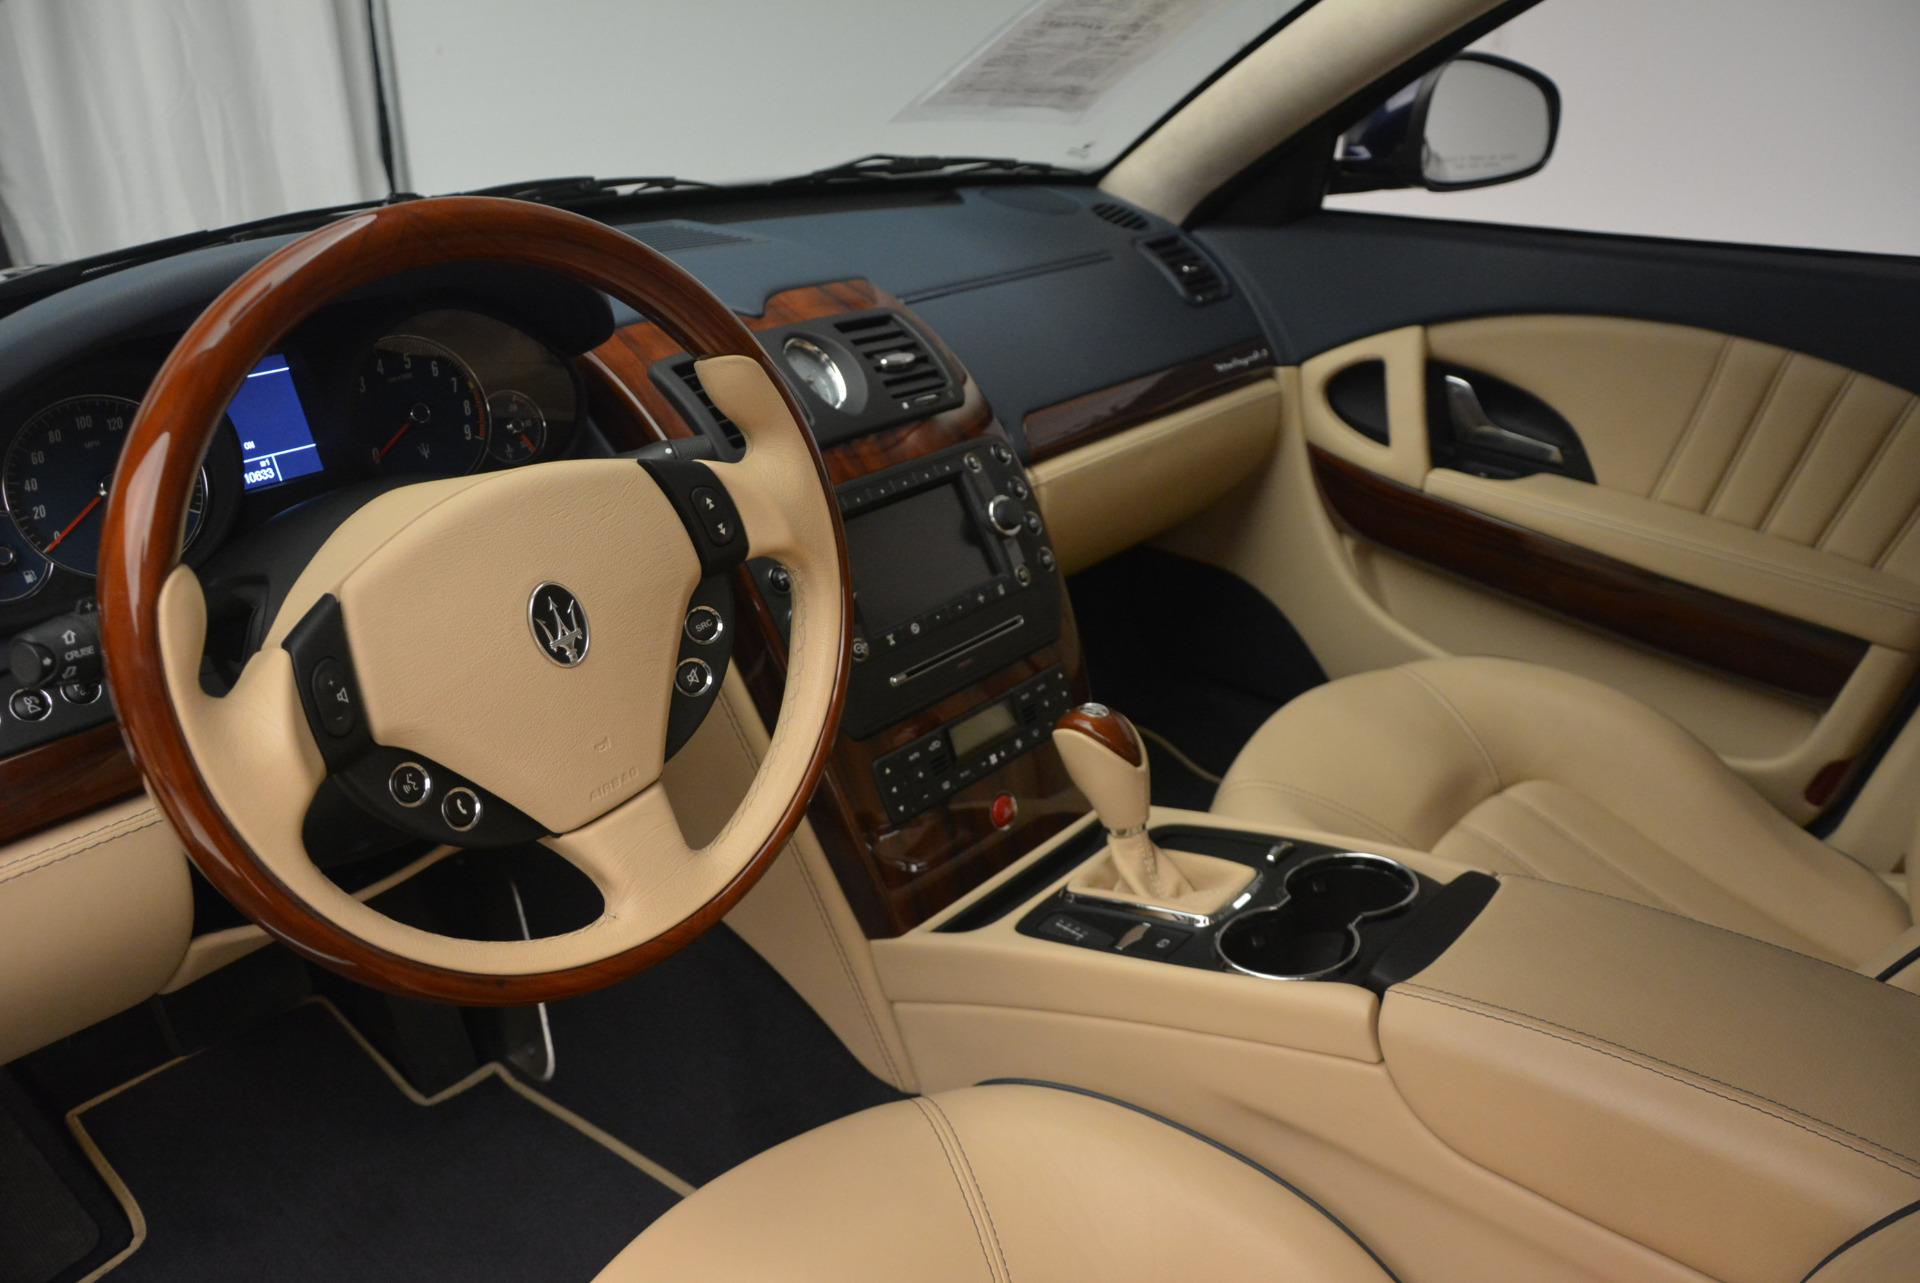 Used 2010 Maserati Quattroporte S For Sale In Westport, CT 795_p15